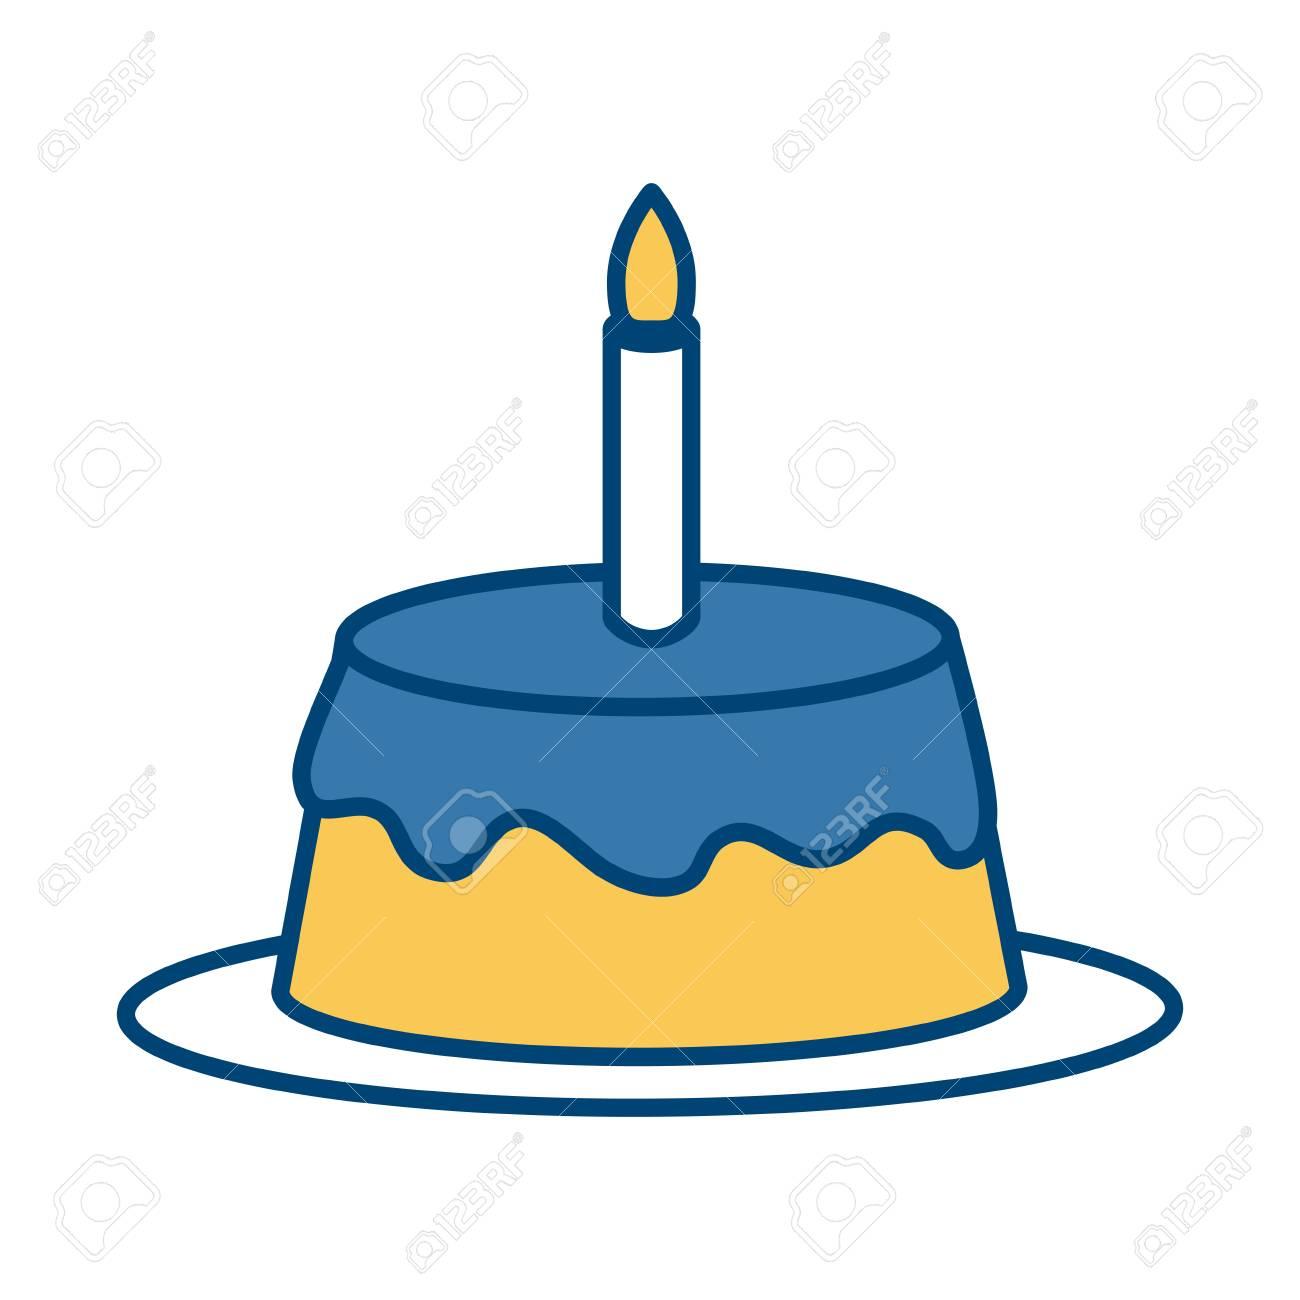 Birthday Cake Isolated Icon Vector Illustration Graphic Design